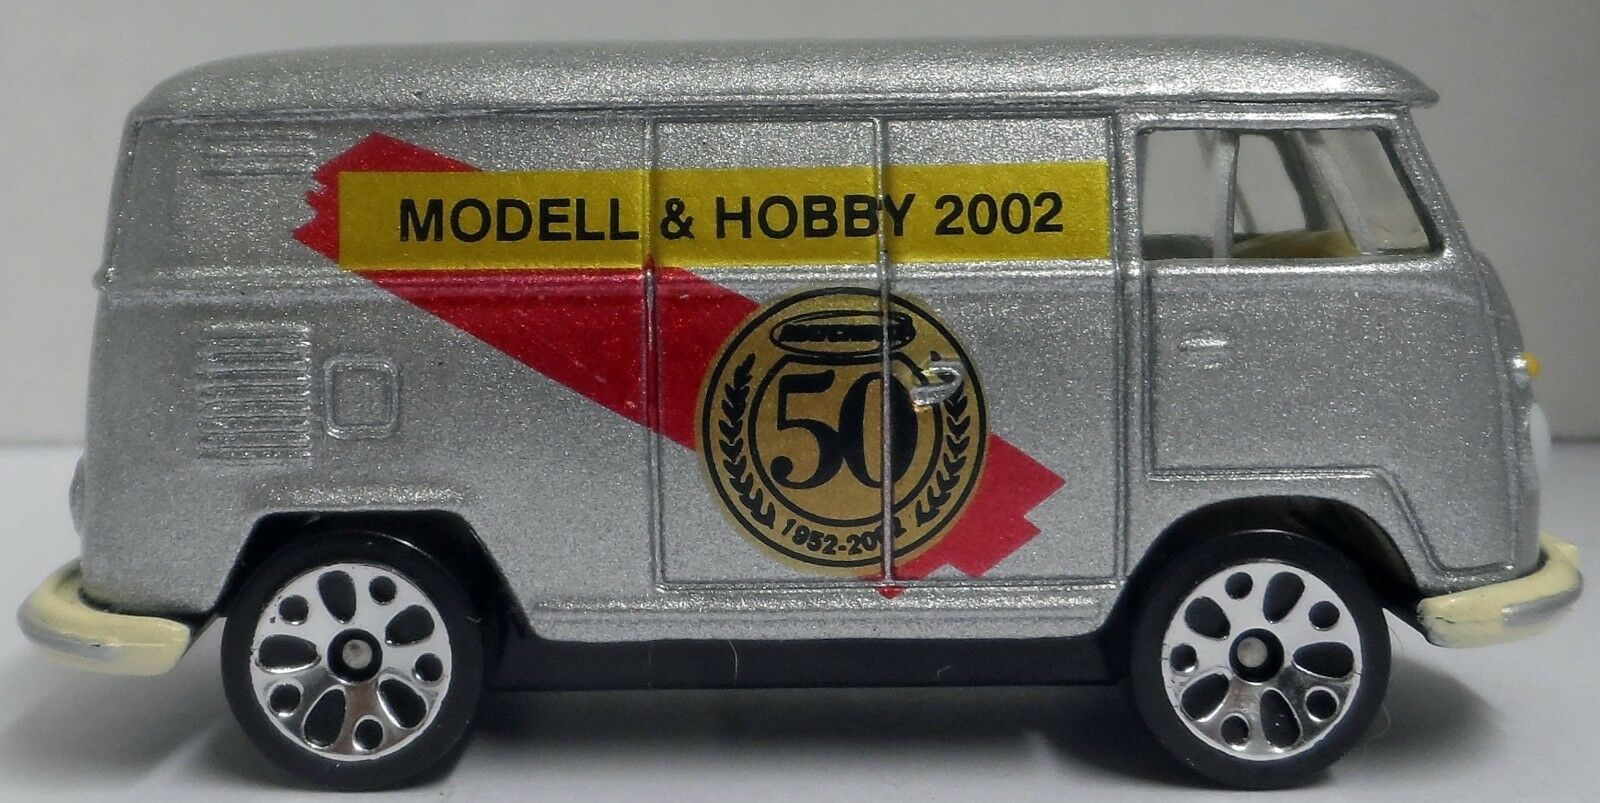 Matchbox VW Volkswagen Matchbox convention 2002 3 van set Mint boxed.